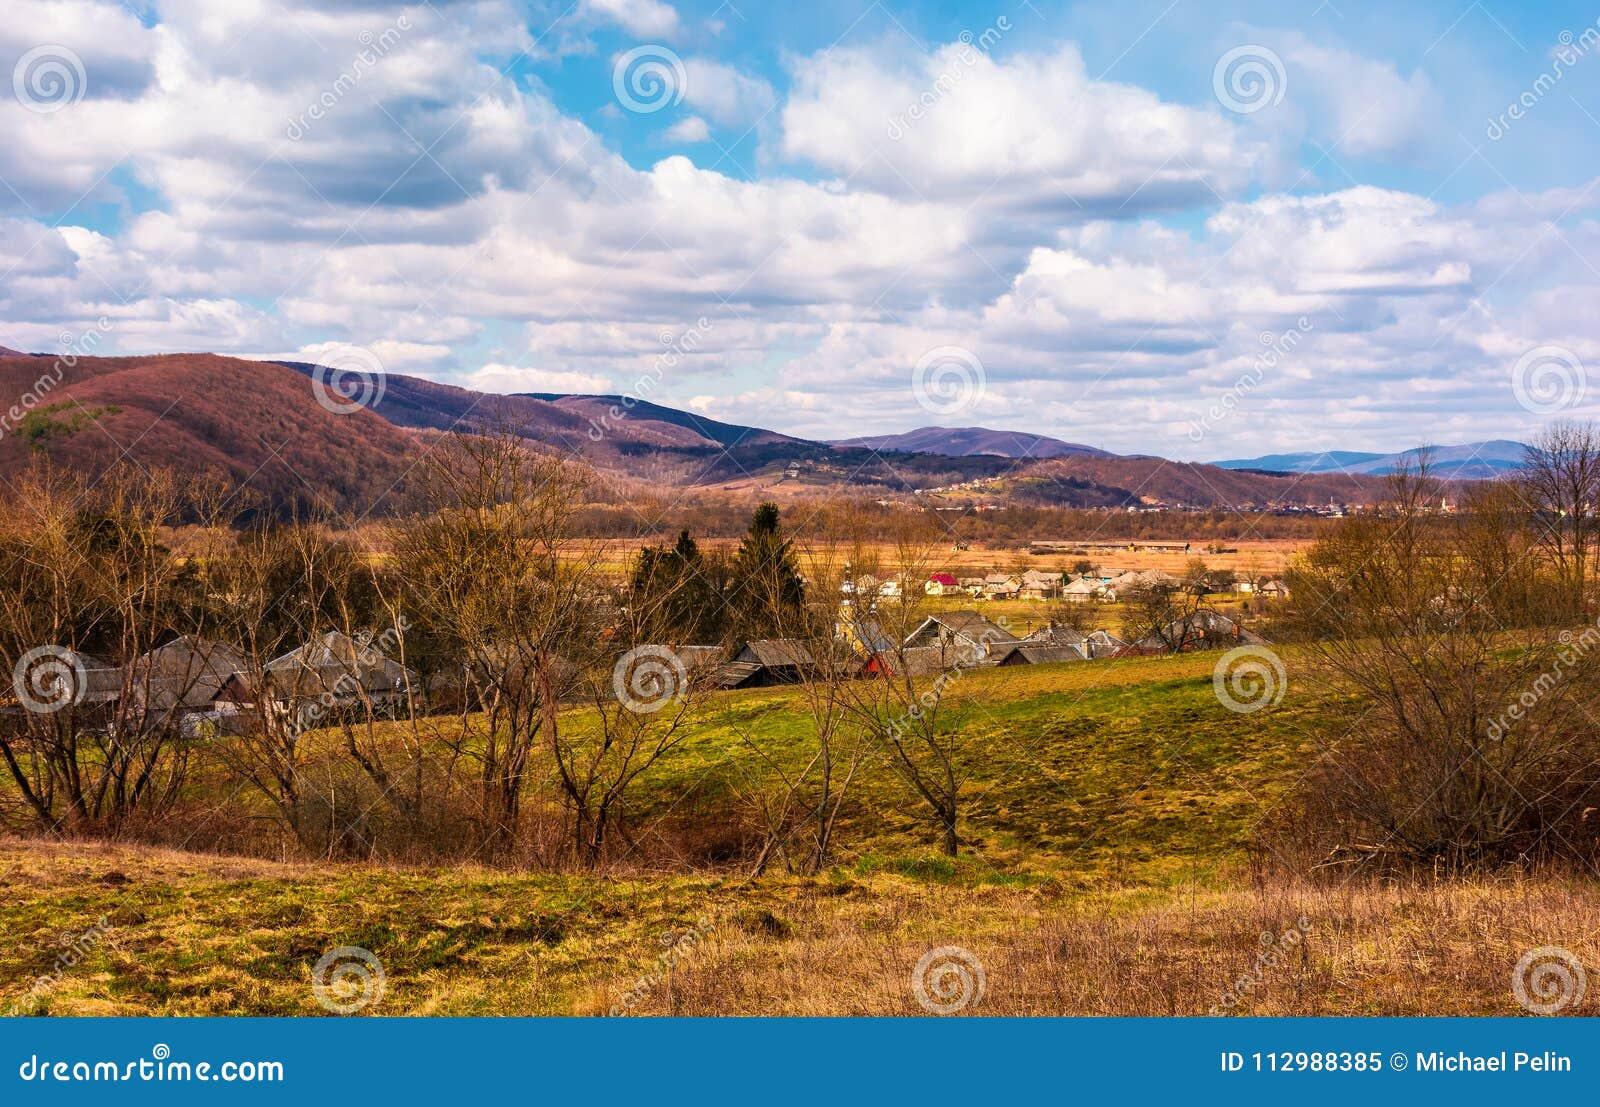 Mountainous countryside in springtime